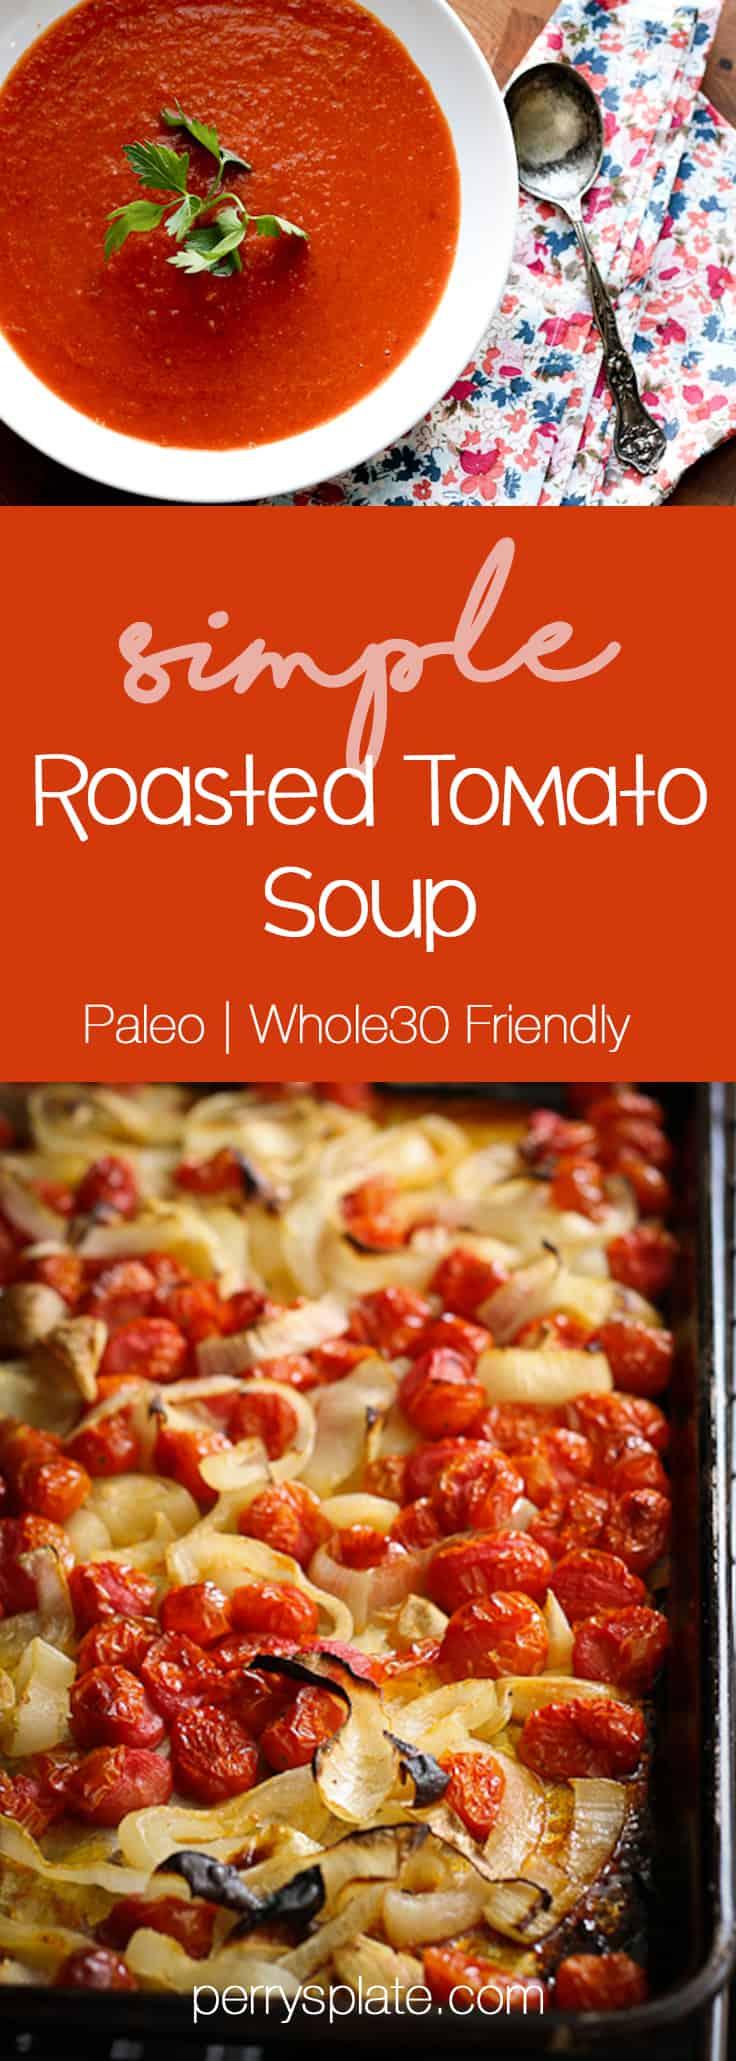 Simple Roasted Tomato Soup | Paleo recipes | Whole30 recipes | soup recipes | tomato recipes | perrysplate.com